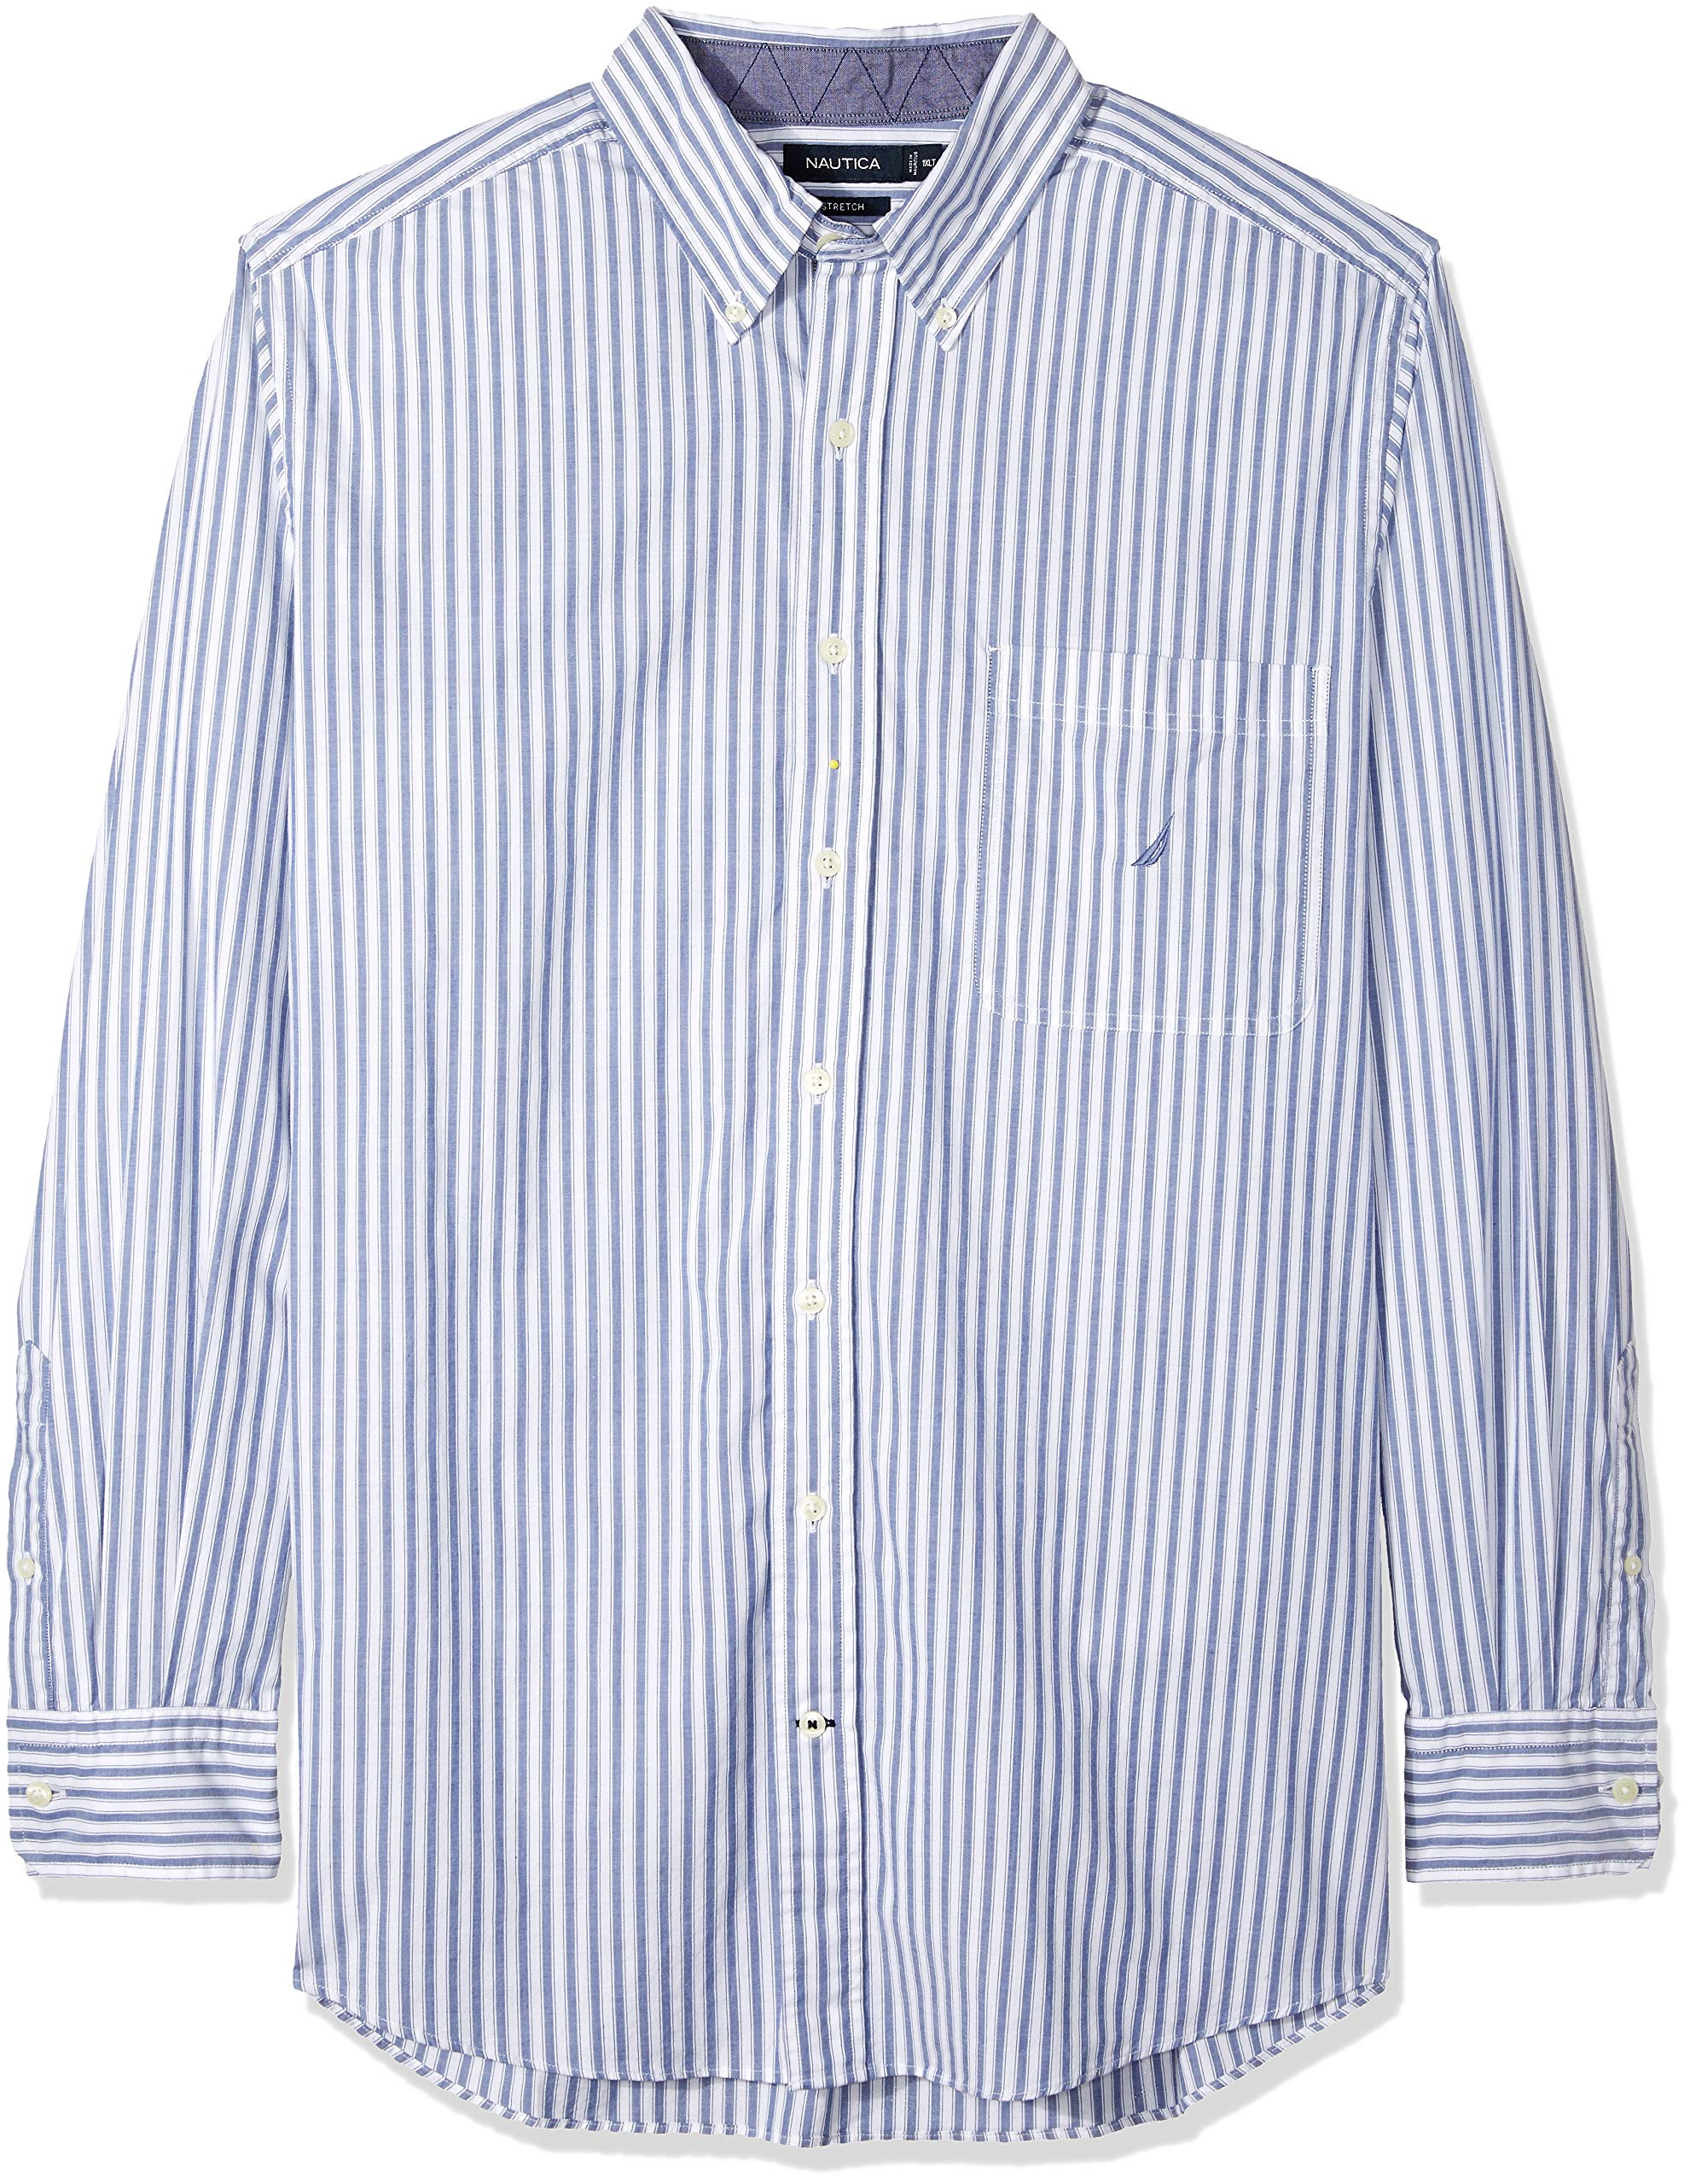 Nautica Men's Big and Tall Classic Fit Long Sleeve Vertical Stripe Button Down Shirt, Ocean Lapis, 2XLT